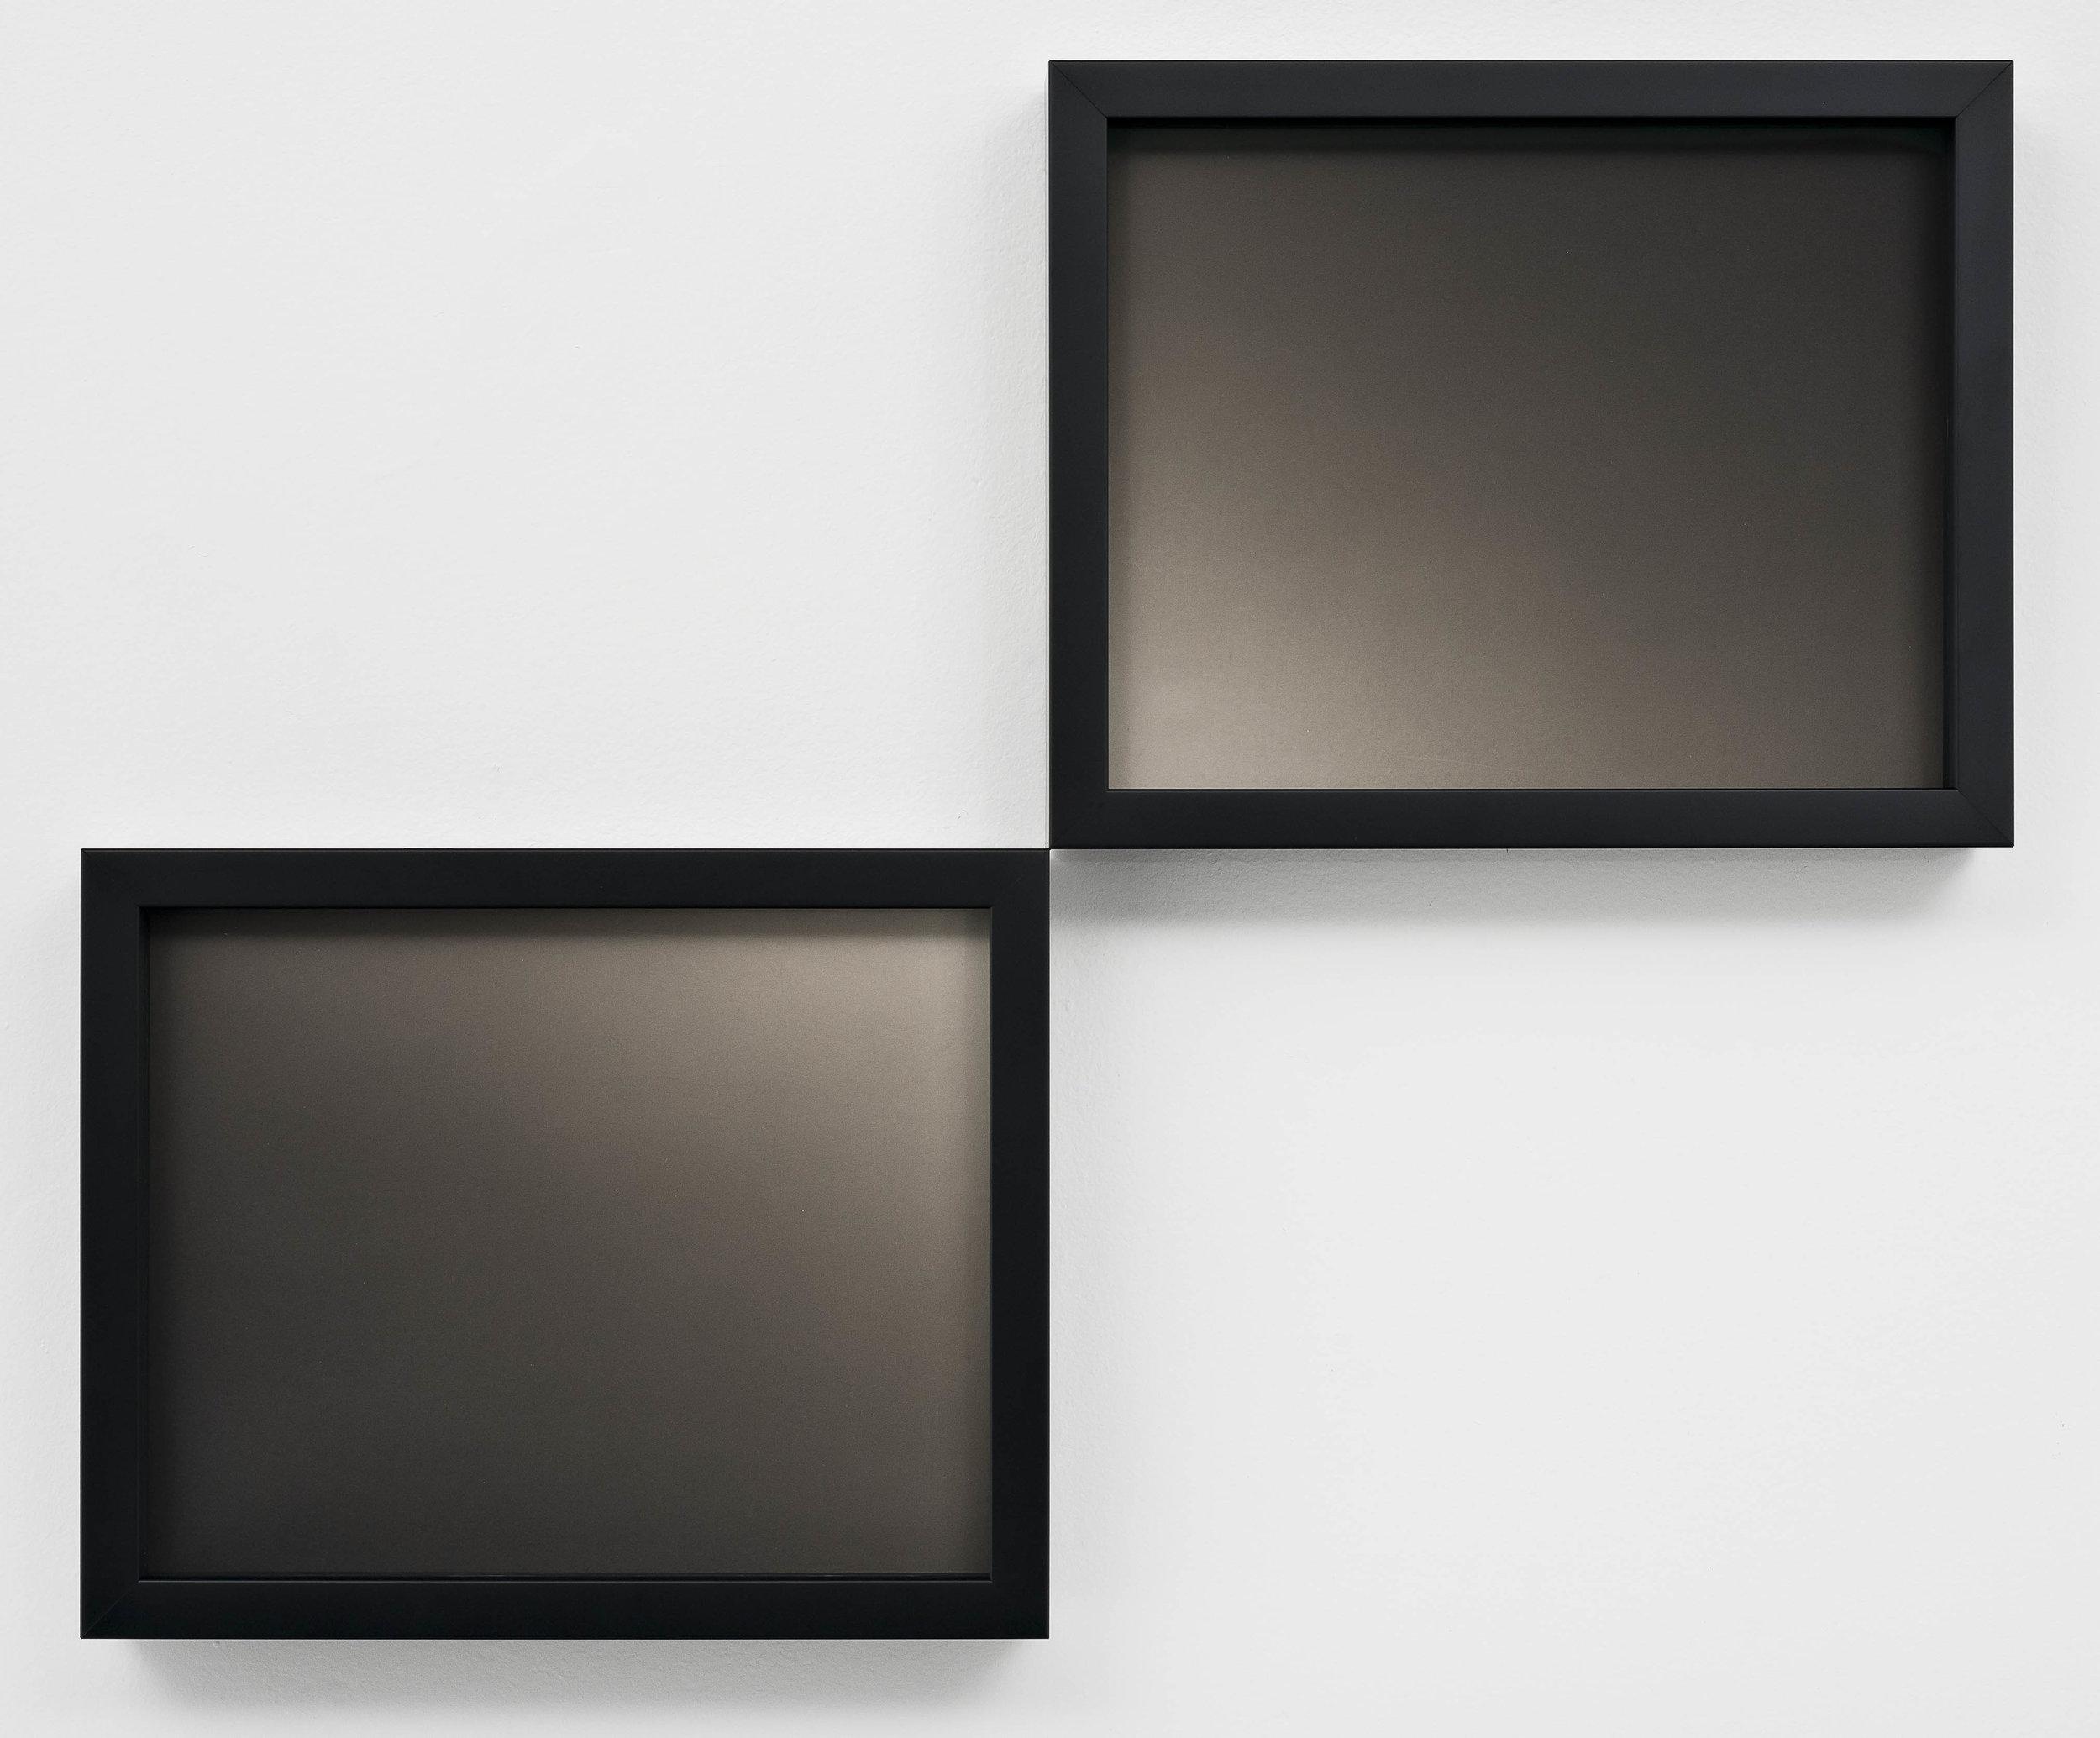 SCOTT B. DAVIS  Double Nova , 2019 Platinum-palladium prints, diptych Overall 17.75 x 21.75 inches Edition 1/3